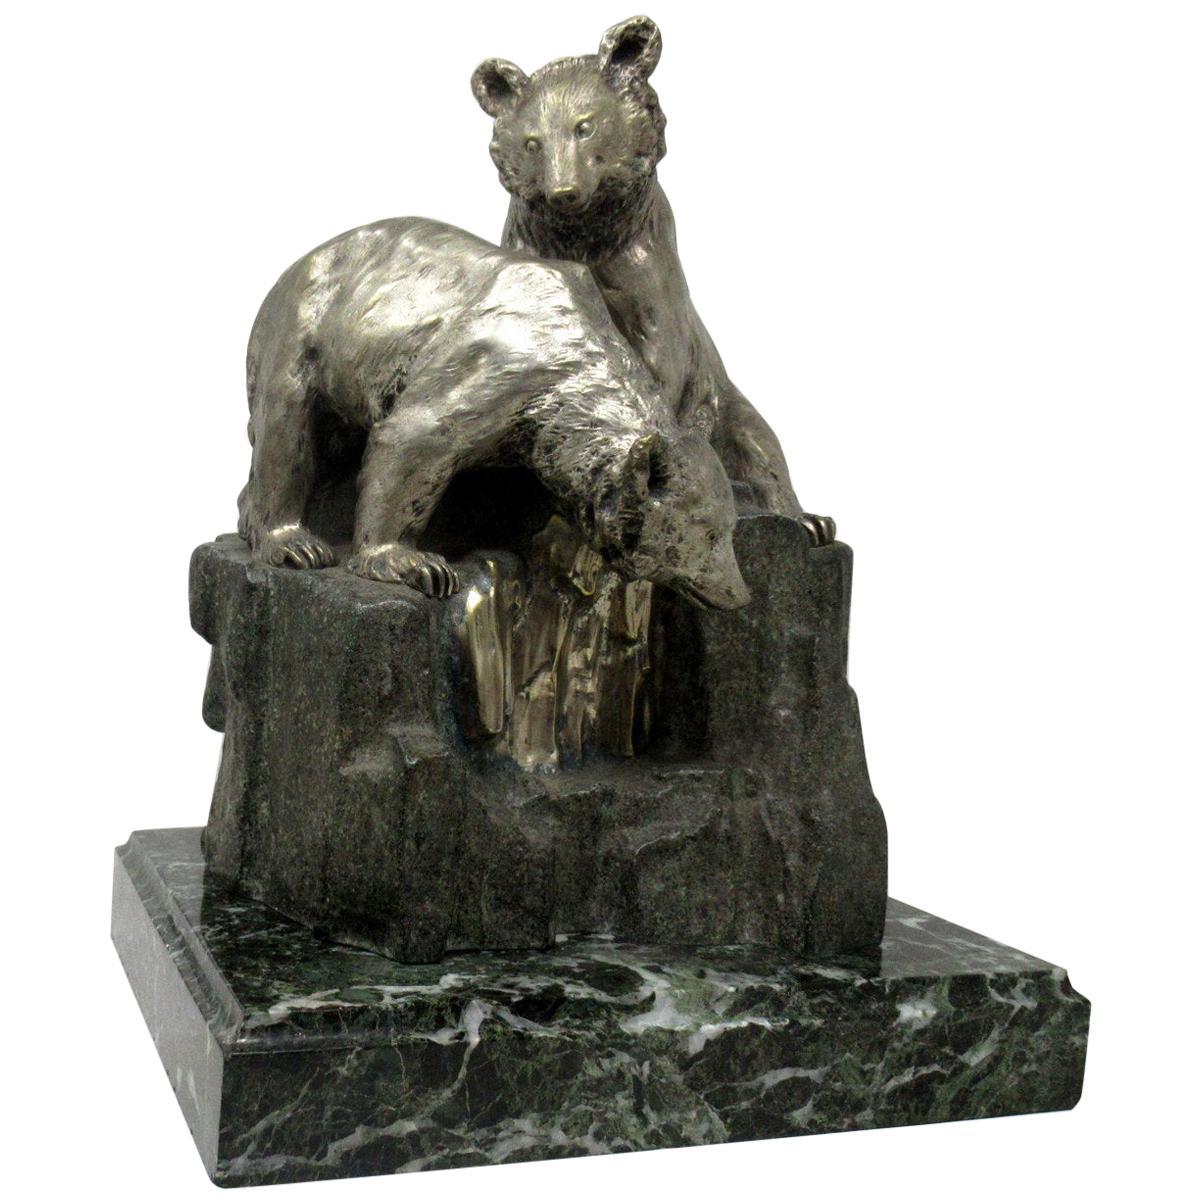 Antique Animal Bear Bronze Group on Green Marble by Giuseppe Gambogi 1862-1938